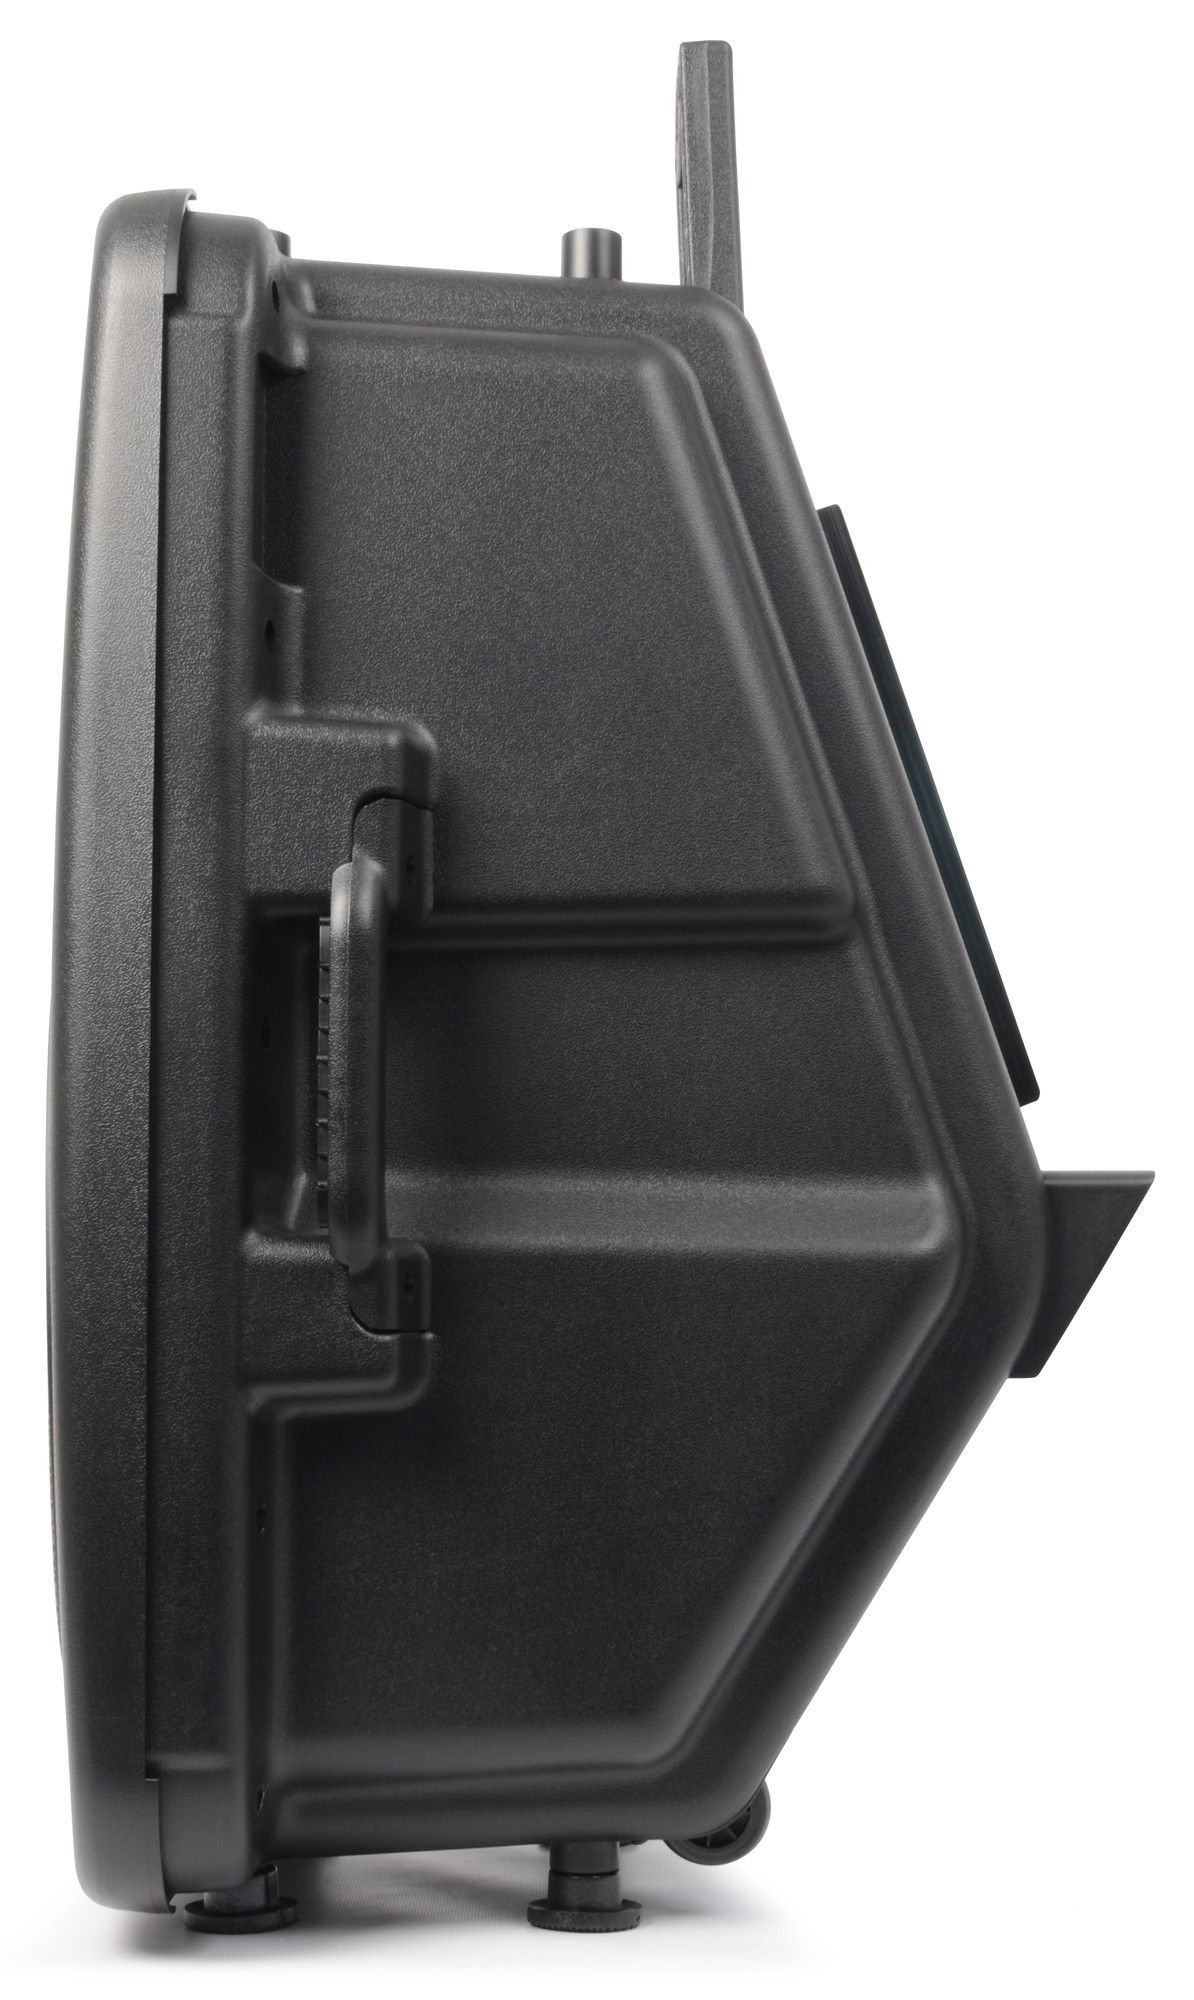 SkyTec SPBT1500A Actieve speaker 800 Watt met bluetooth en USB/MP3 thumbnail